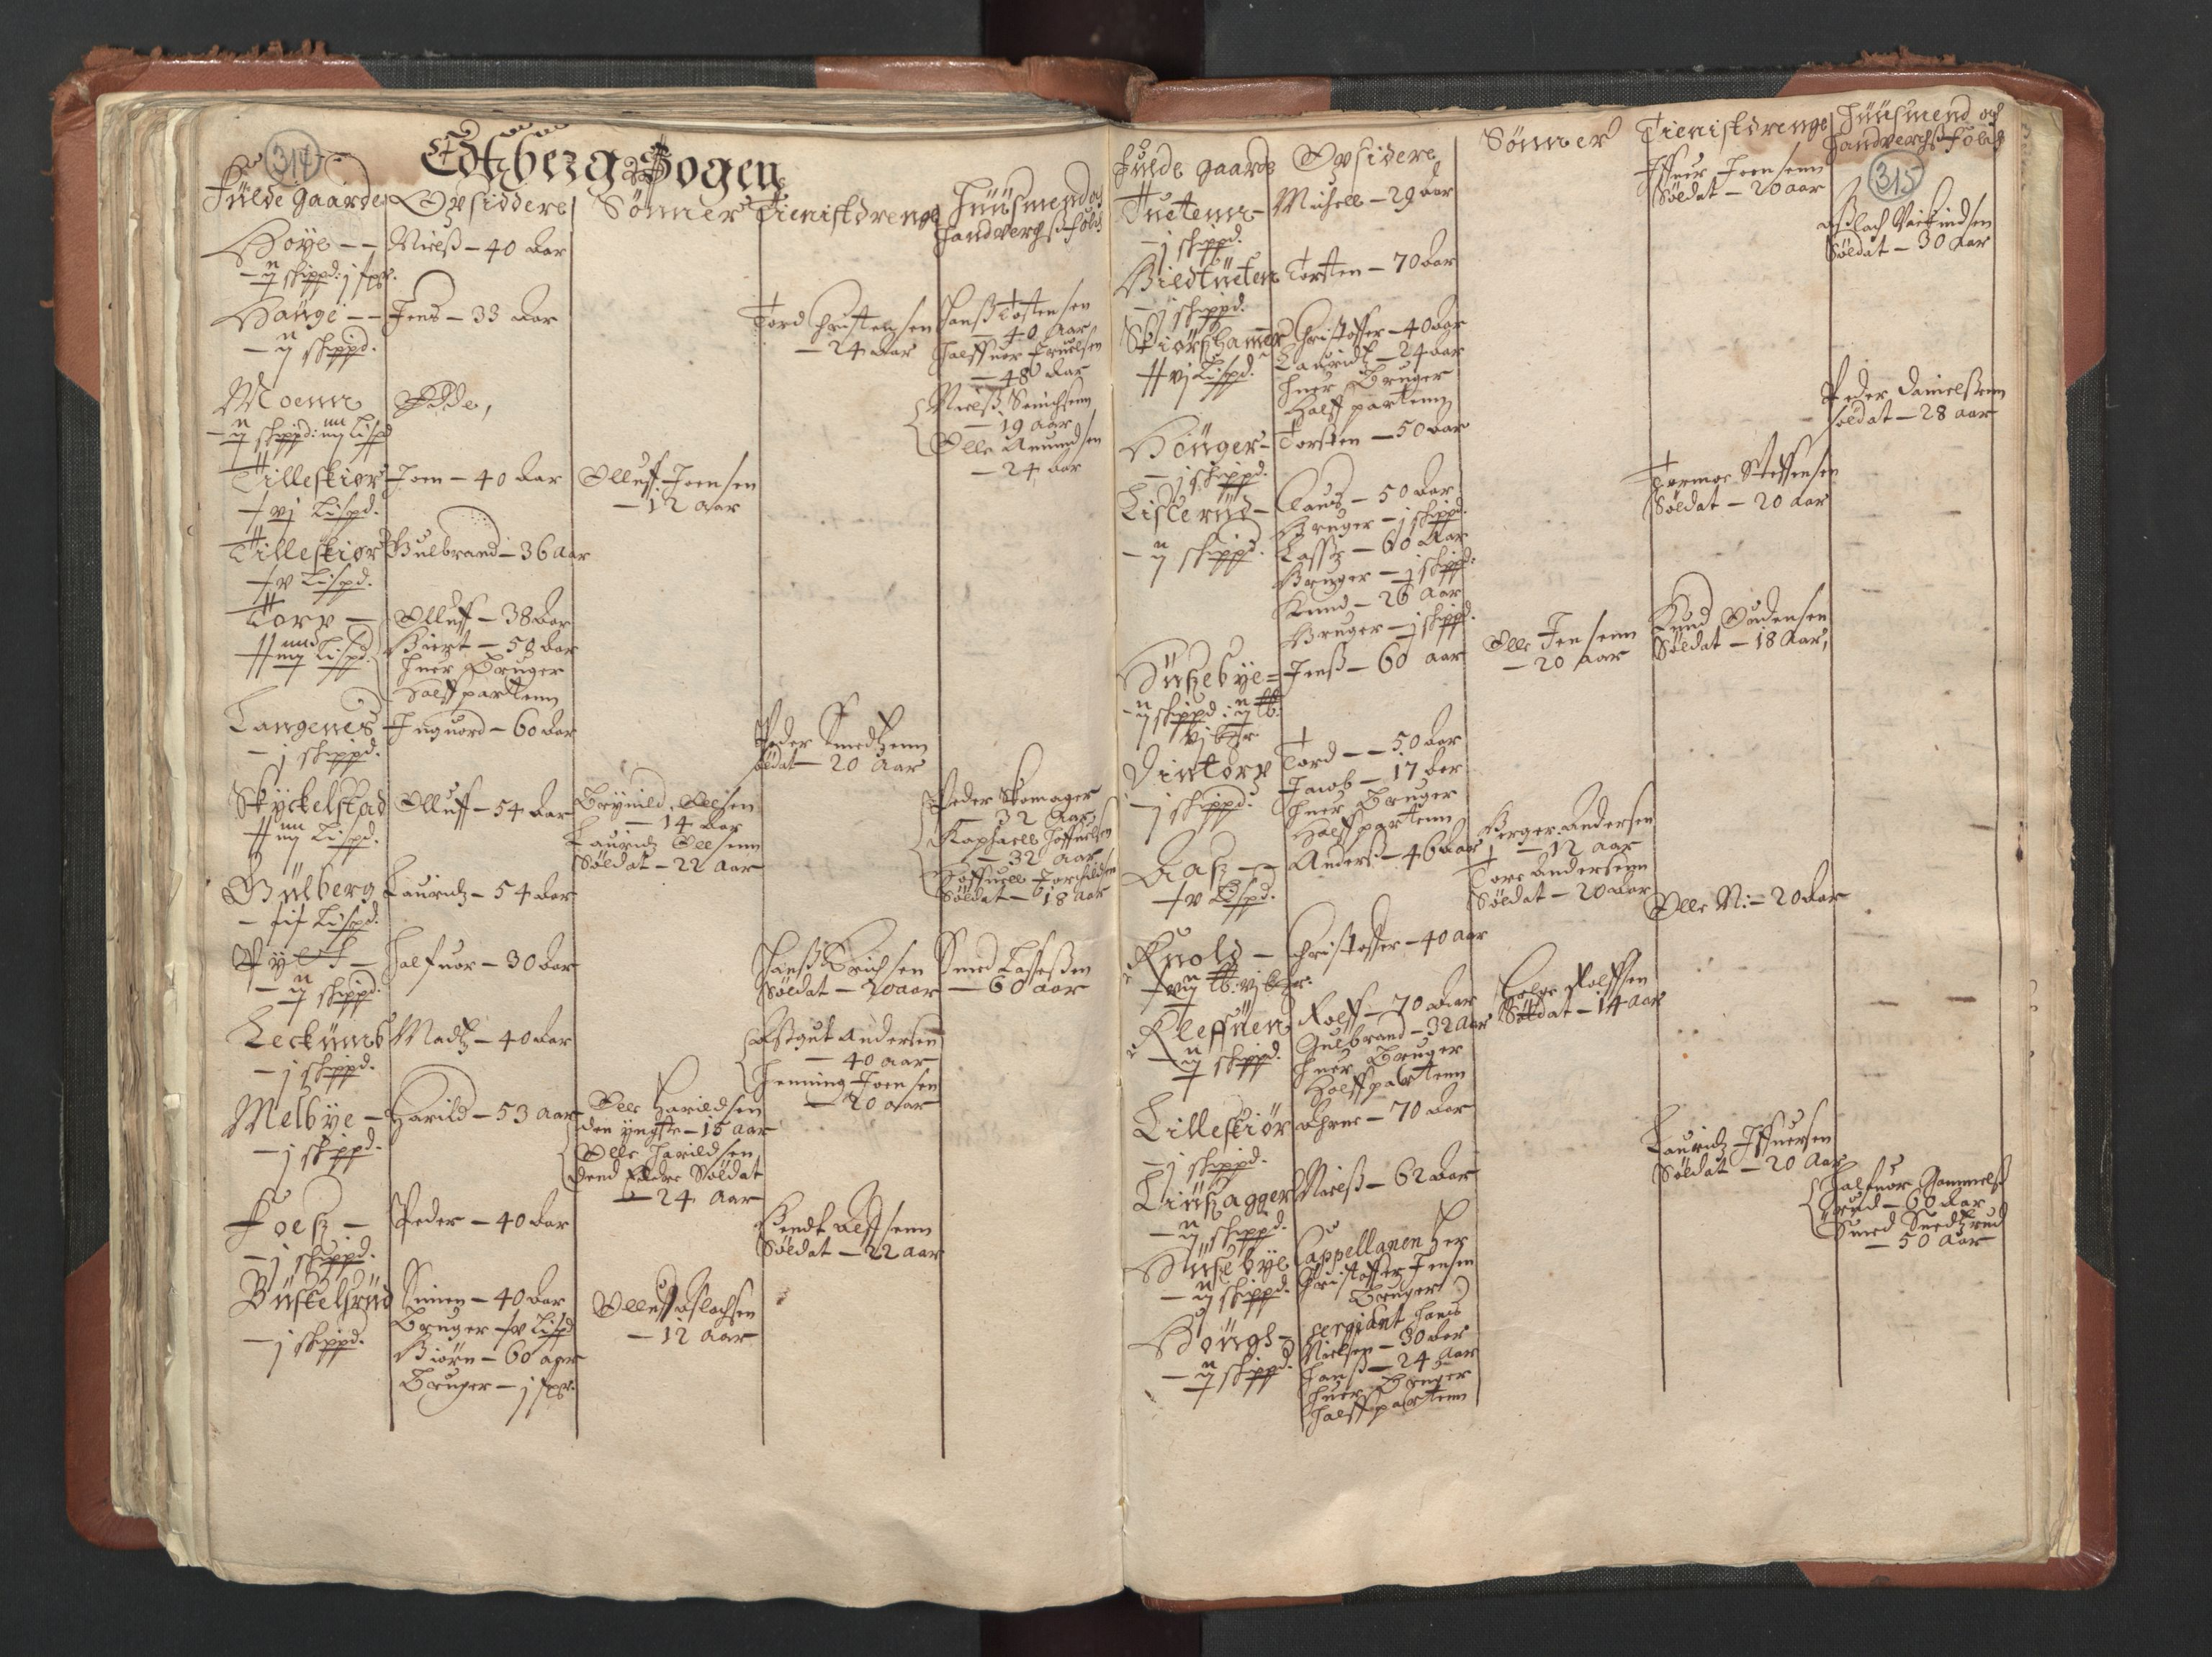 RA, Fogdenes og sorenskrivernes manntall 1664-1666, nr. 1: Fogderier (len og skipreider) i nåværende Østfold fylke, 1664, s. 314-315